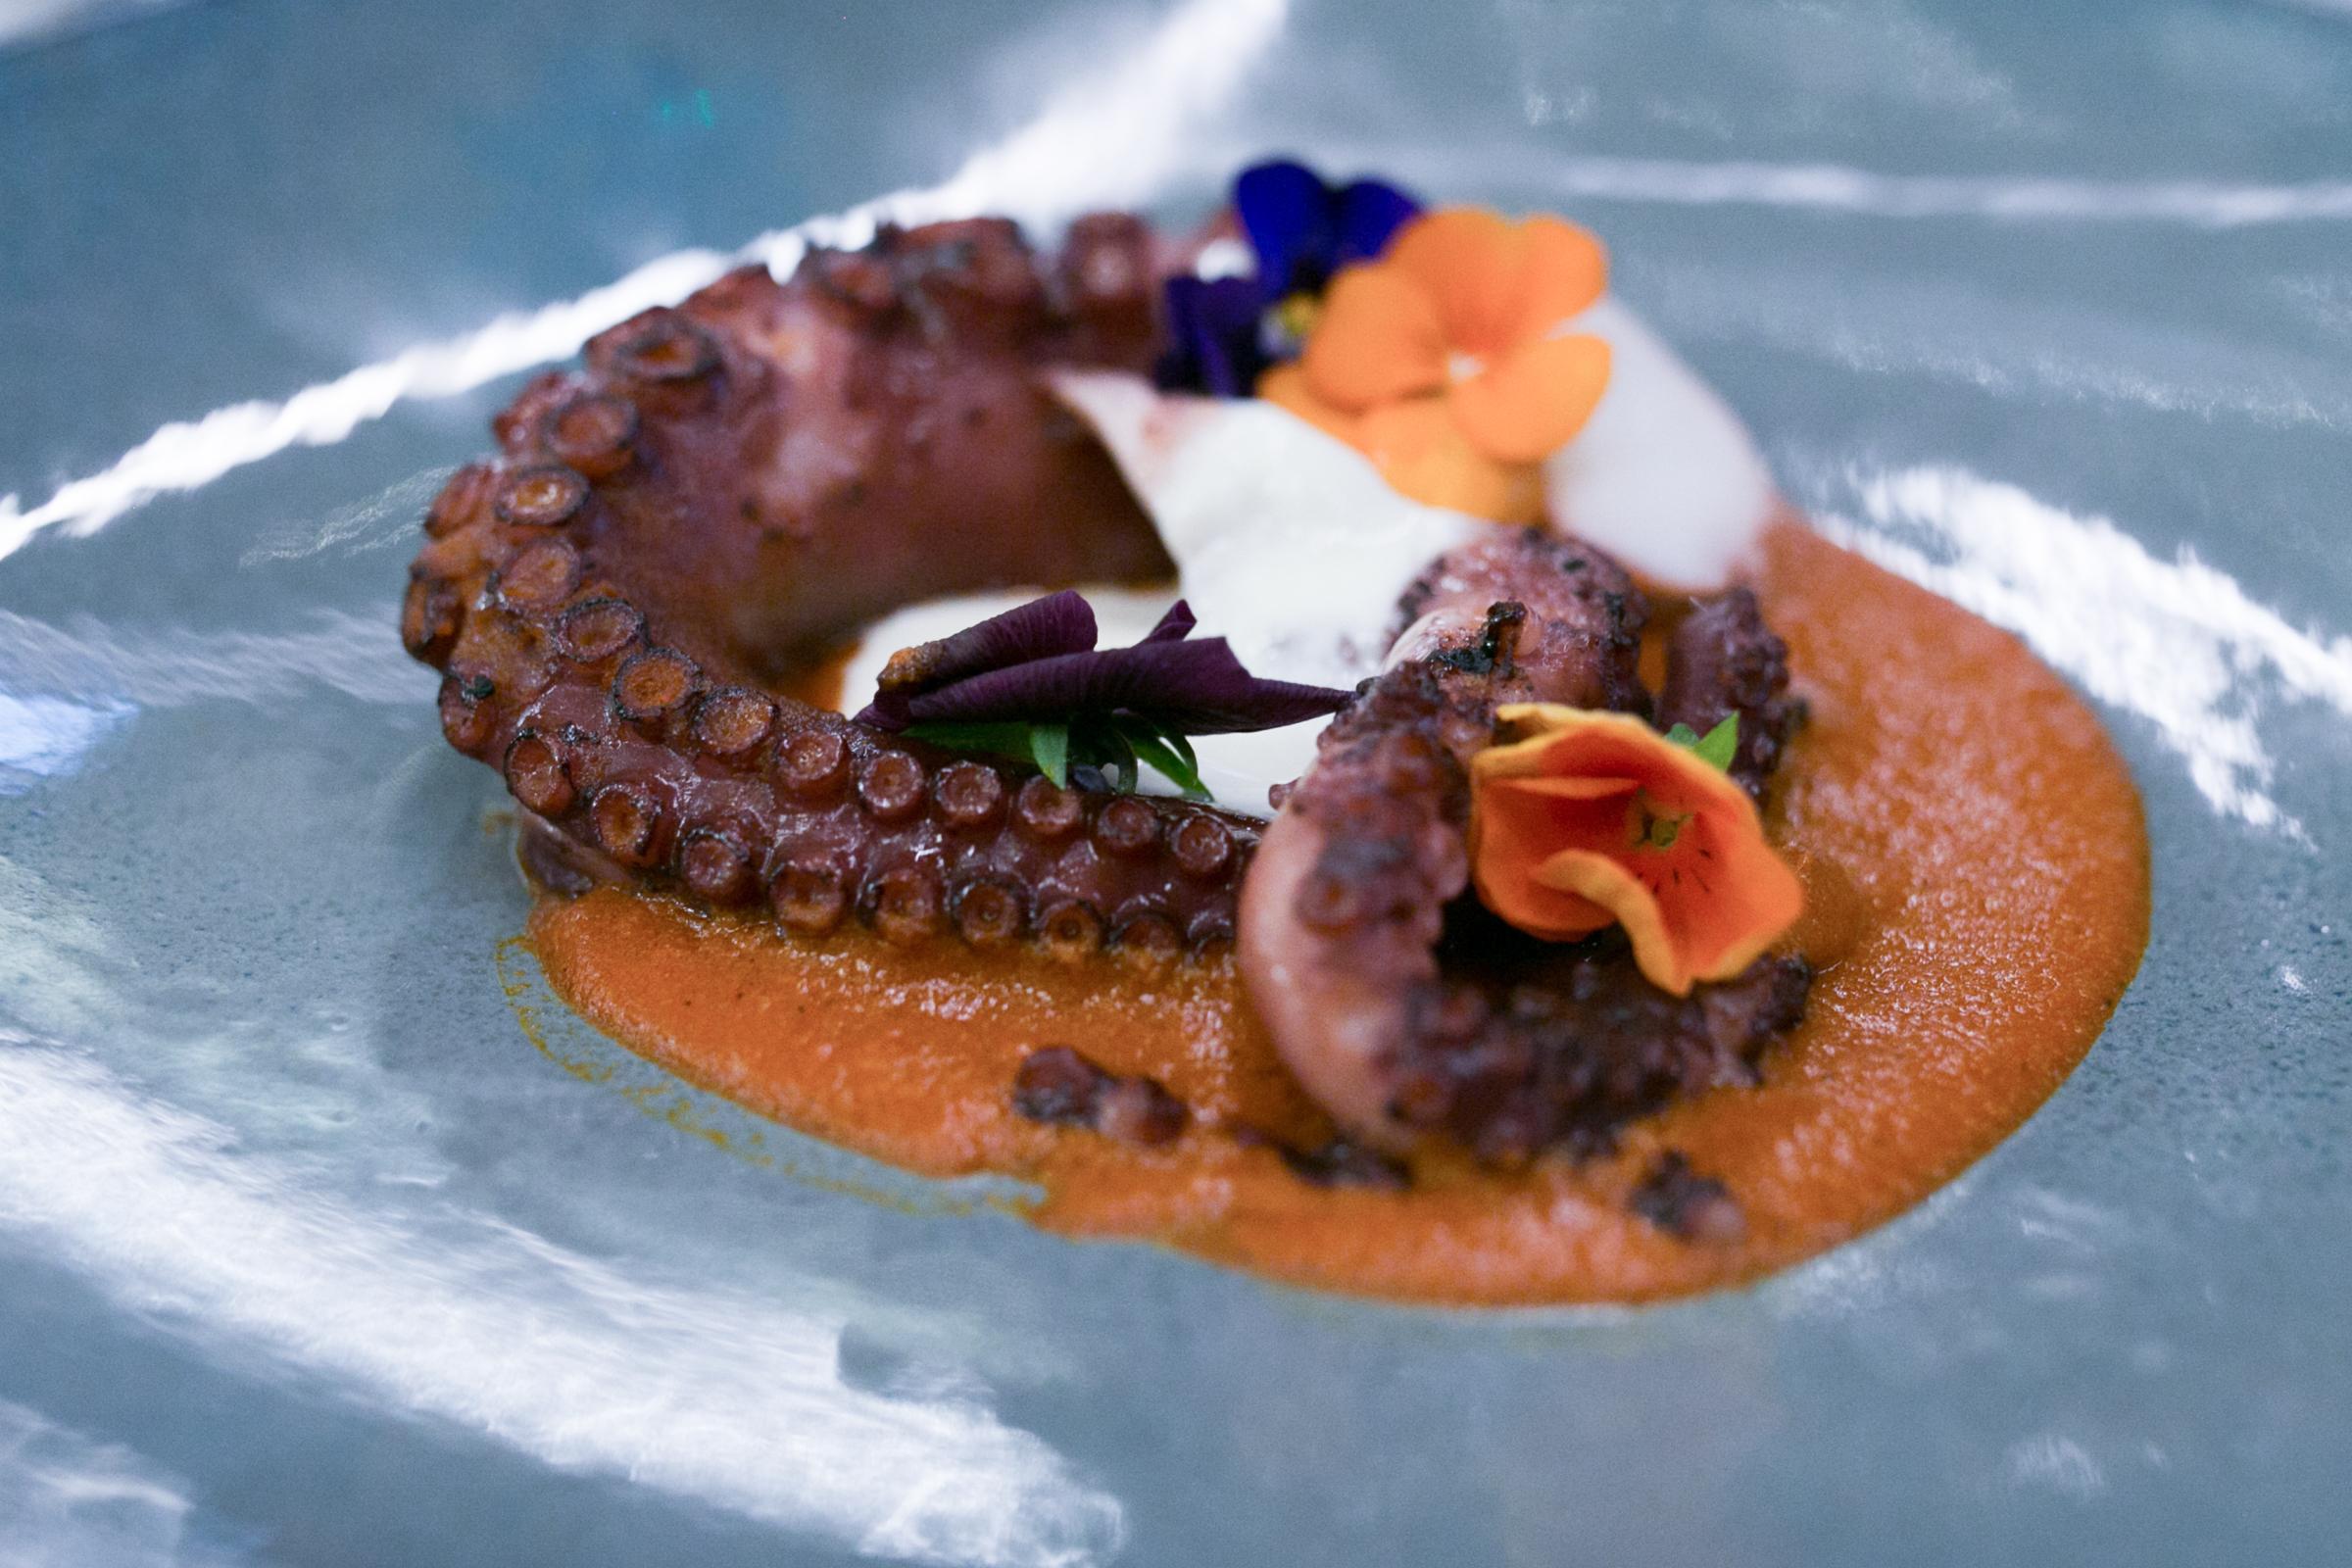 Caramel-restaurant-and-lounge-london-abu-dabi-dubai-oman-new-restaurant-in-london-minas-planet-review-jasmina-haskovic17.jpg